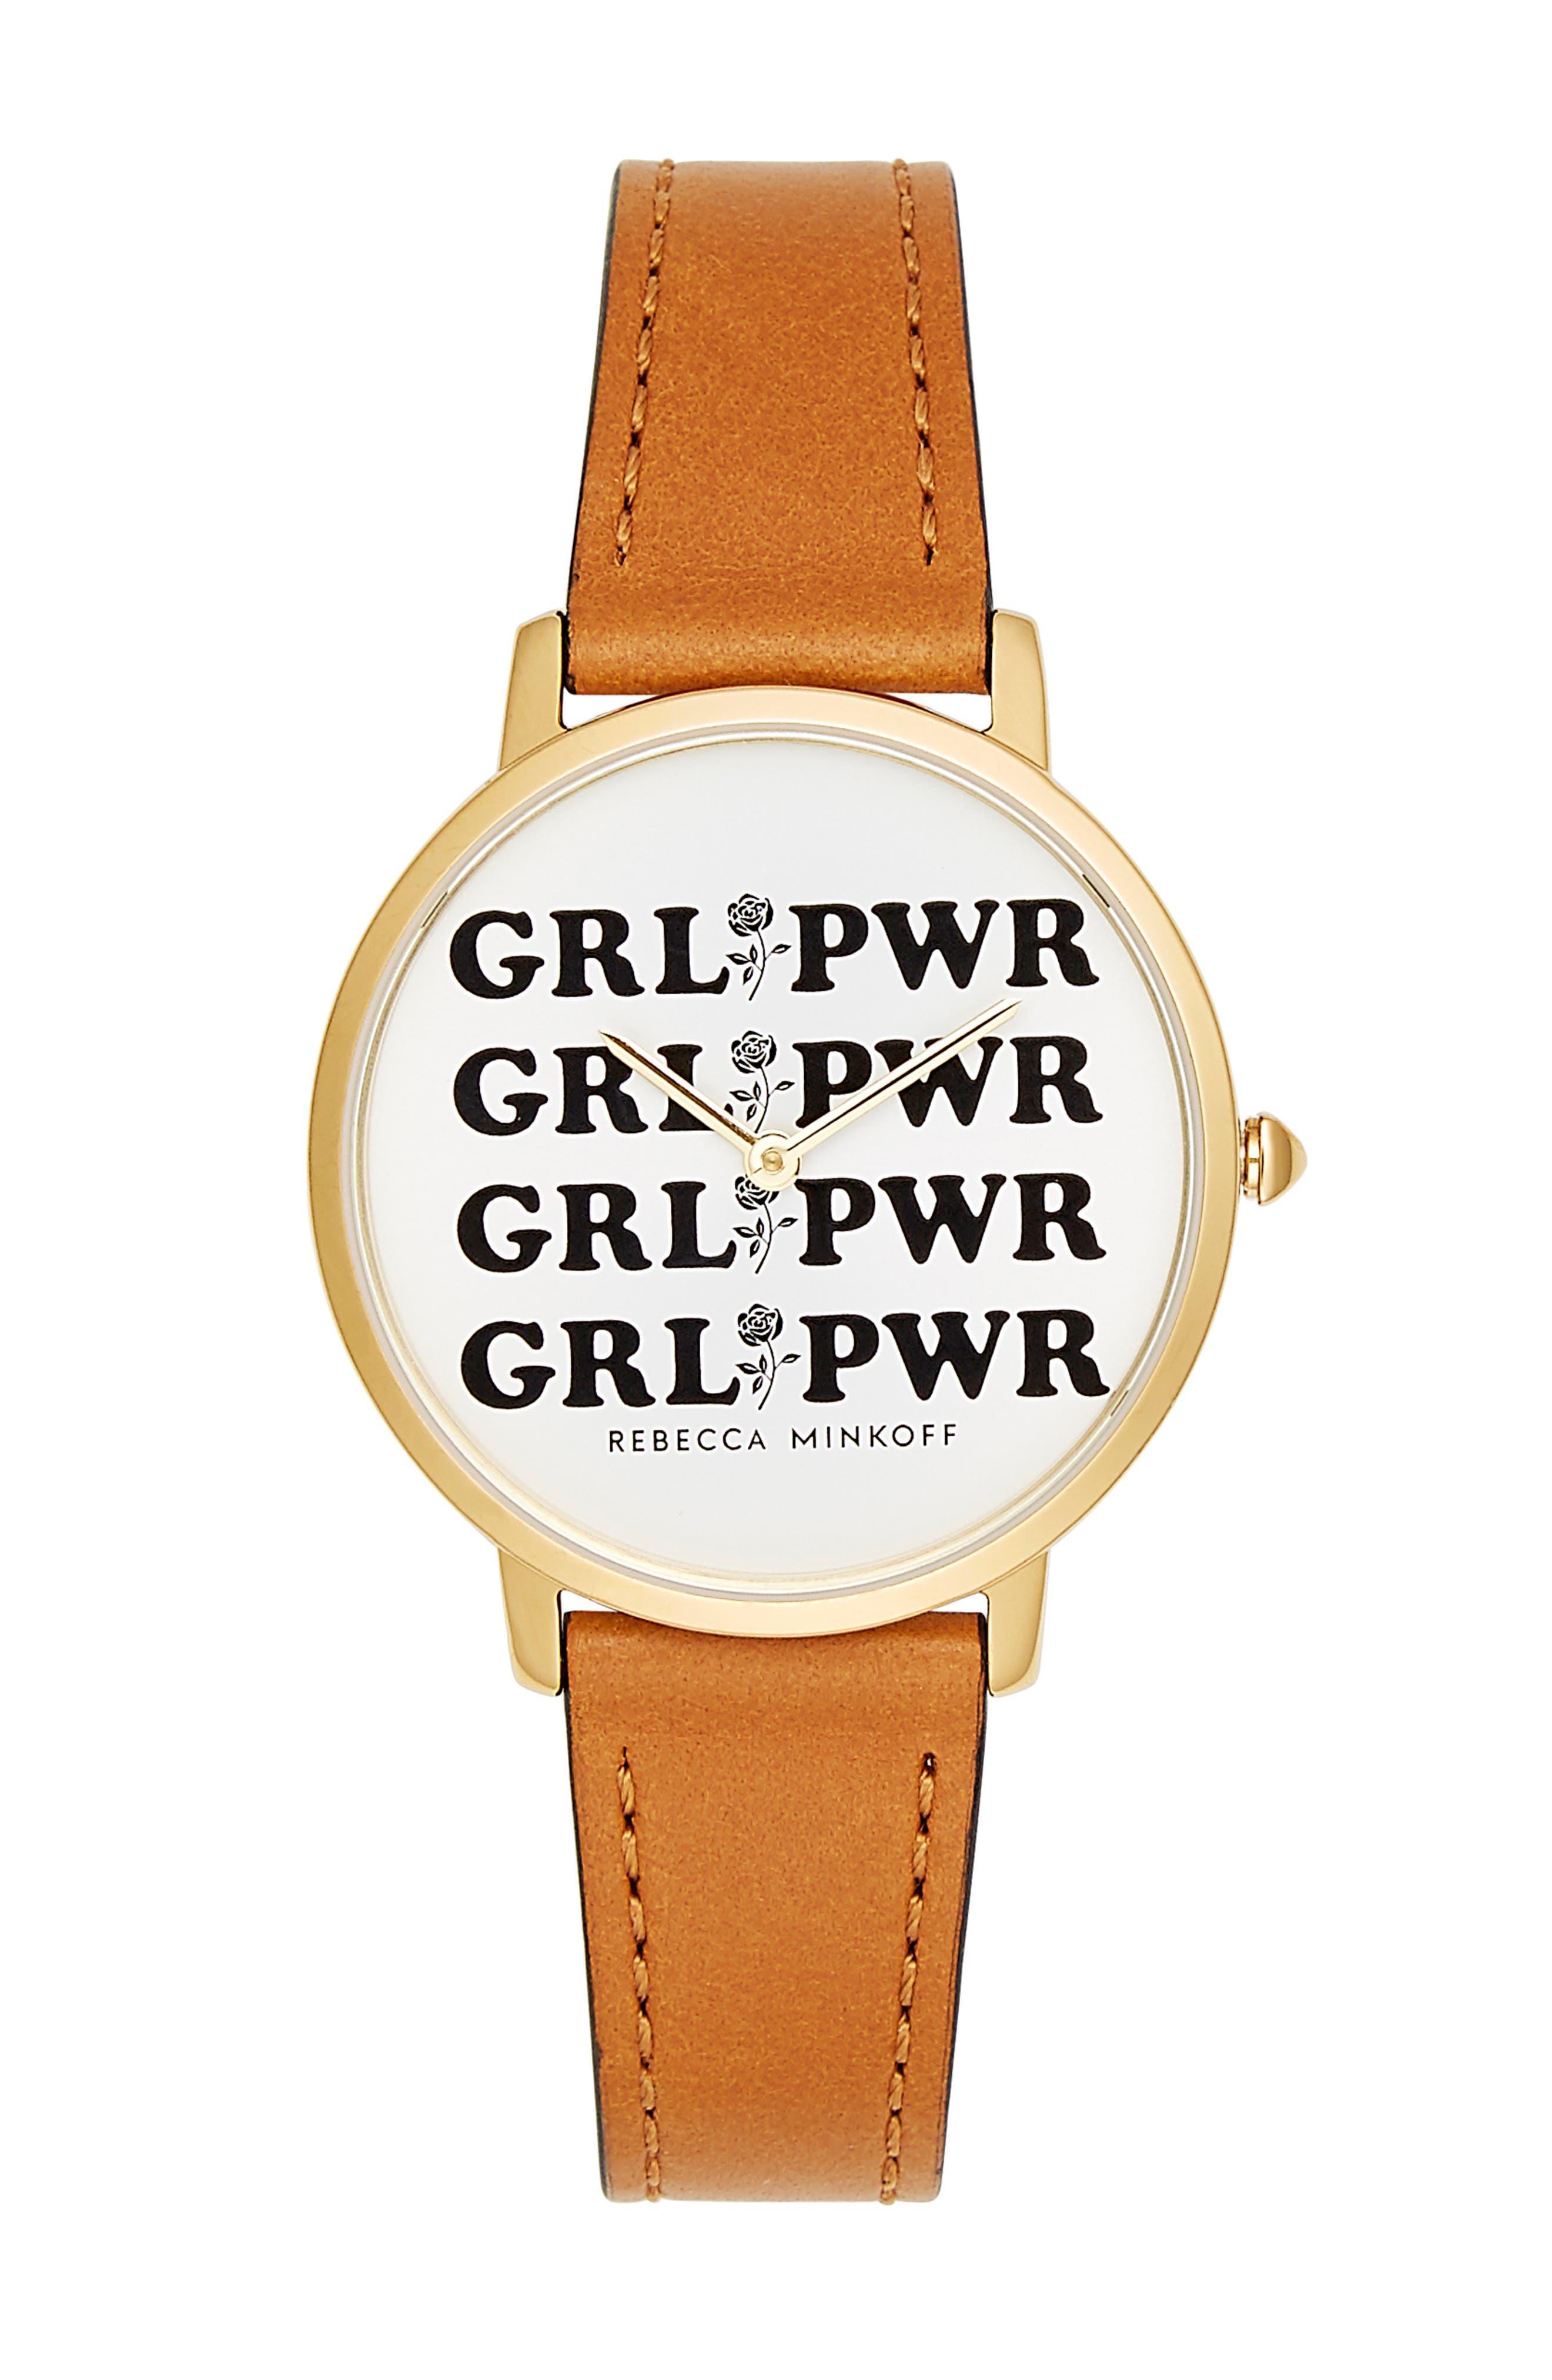 REBECCA MINKOFF Rebeca Minkoff Major GRL PWR Leather Strap Watch, 35mm, Main, color, 200